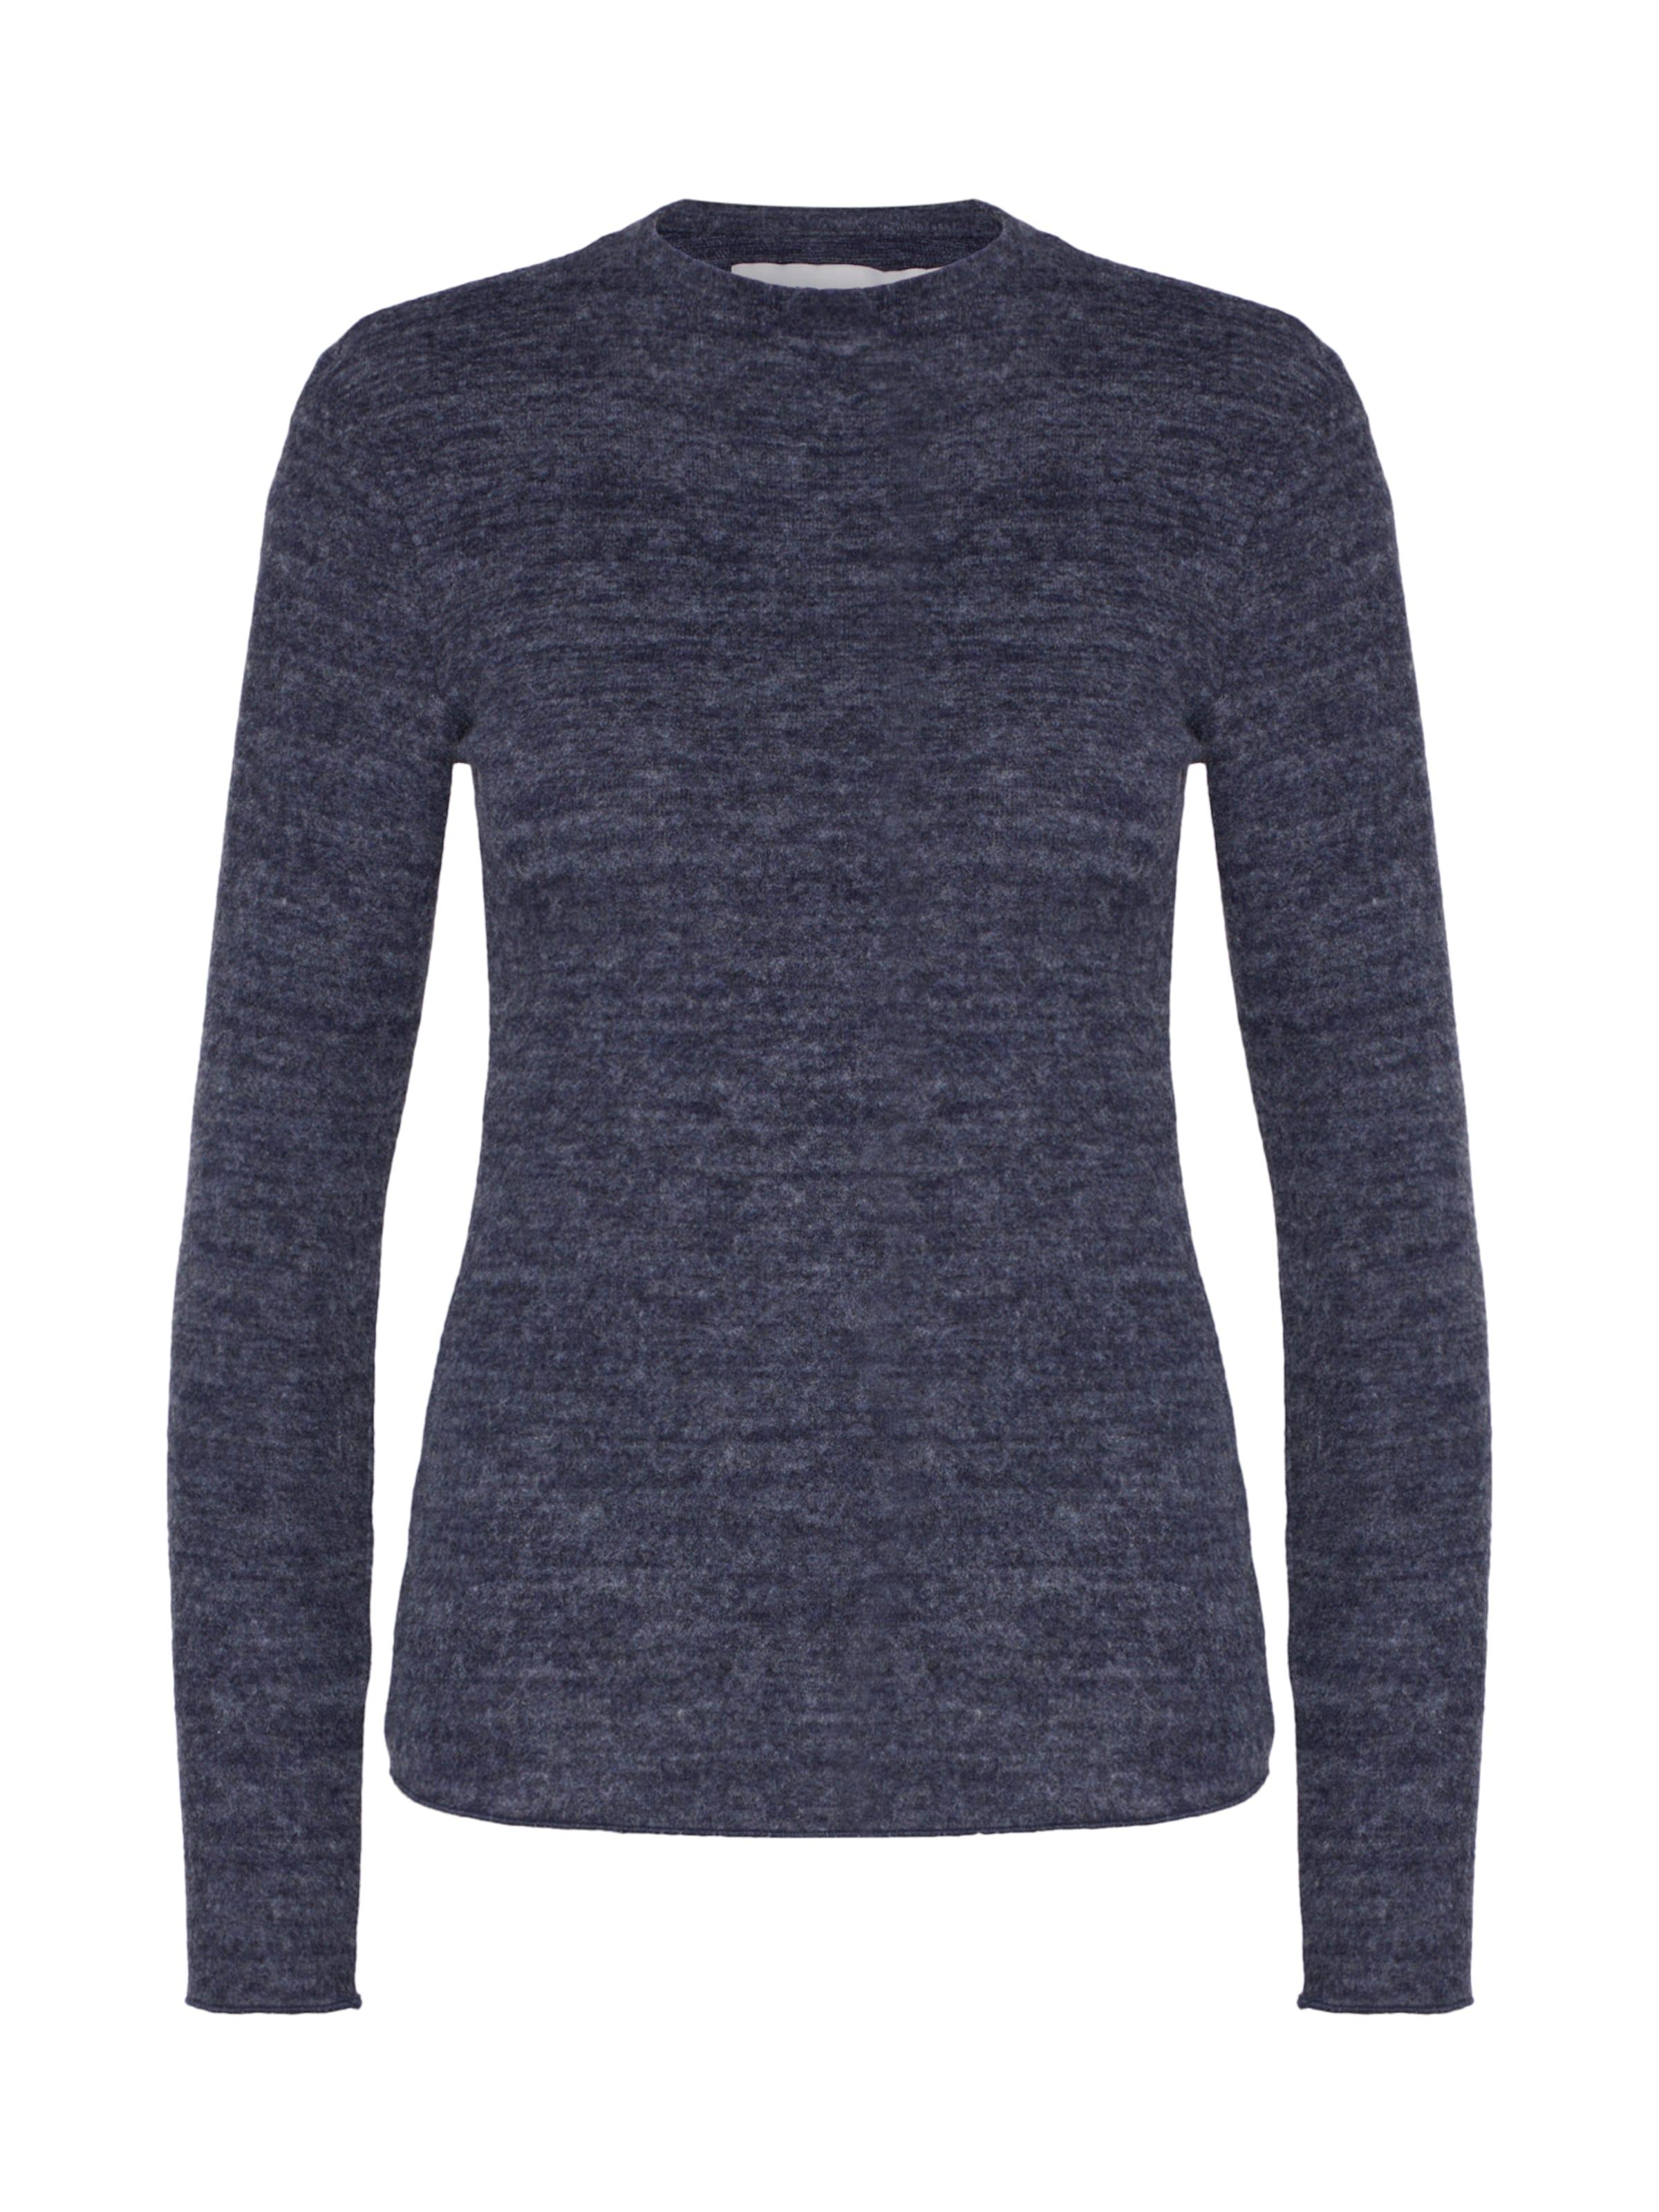 In Ivyrevel 'belinda' Ivyrevel Pullover Blau TOXPuwkZil